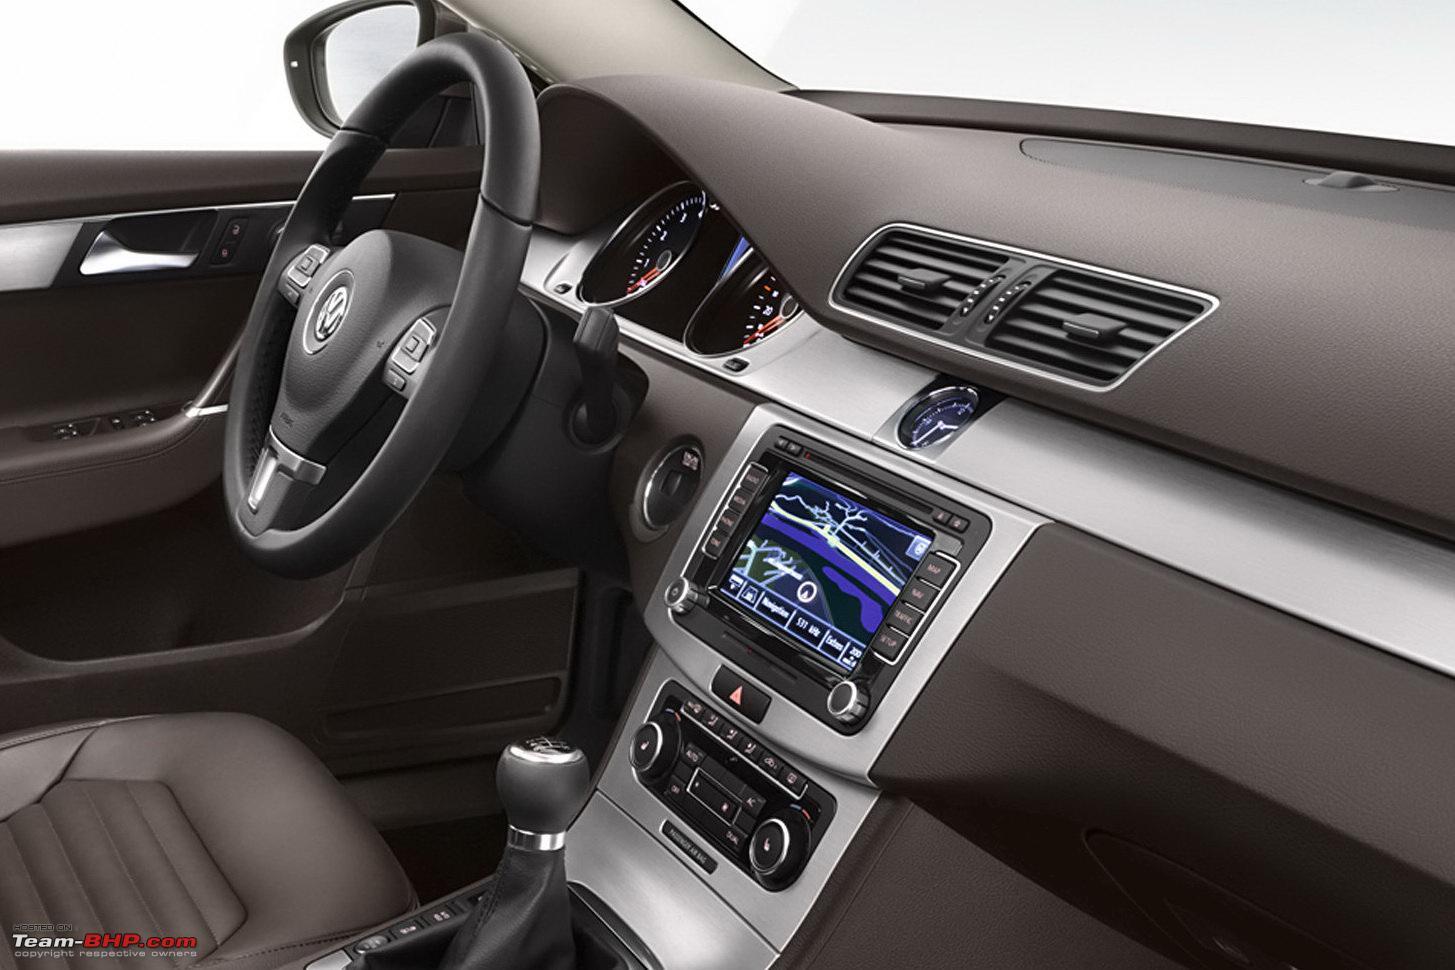 Стоит ли зимой перед началом движения прогревать коробку DSG на VW Passat B7?